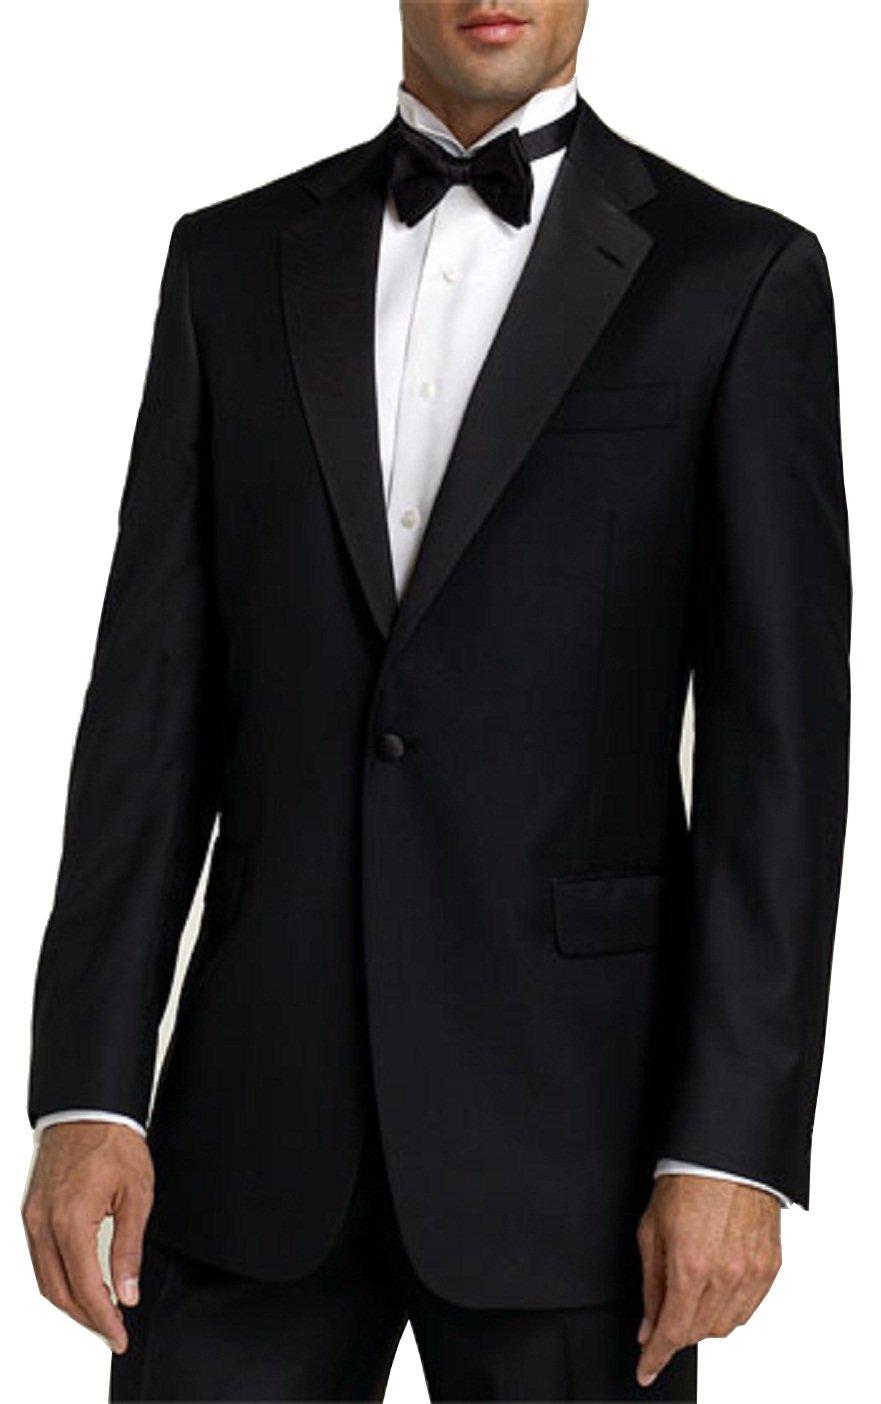 Neil Allyn Tuxedo with Flat Front Pants - 44L